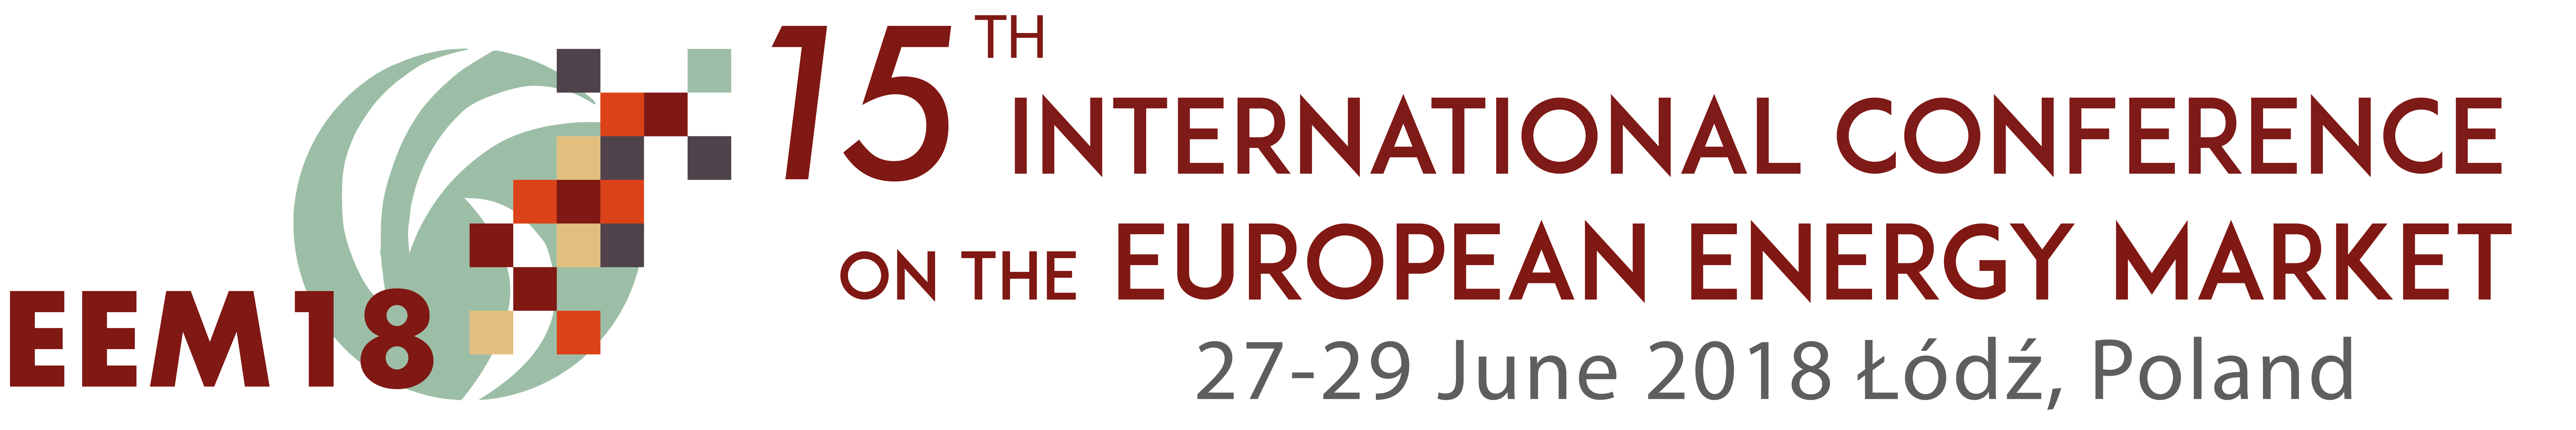 XVINTERNATIONAL CONFERENCE ON THE EUROPEAN ENERGY MARKET